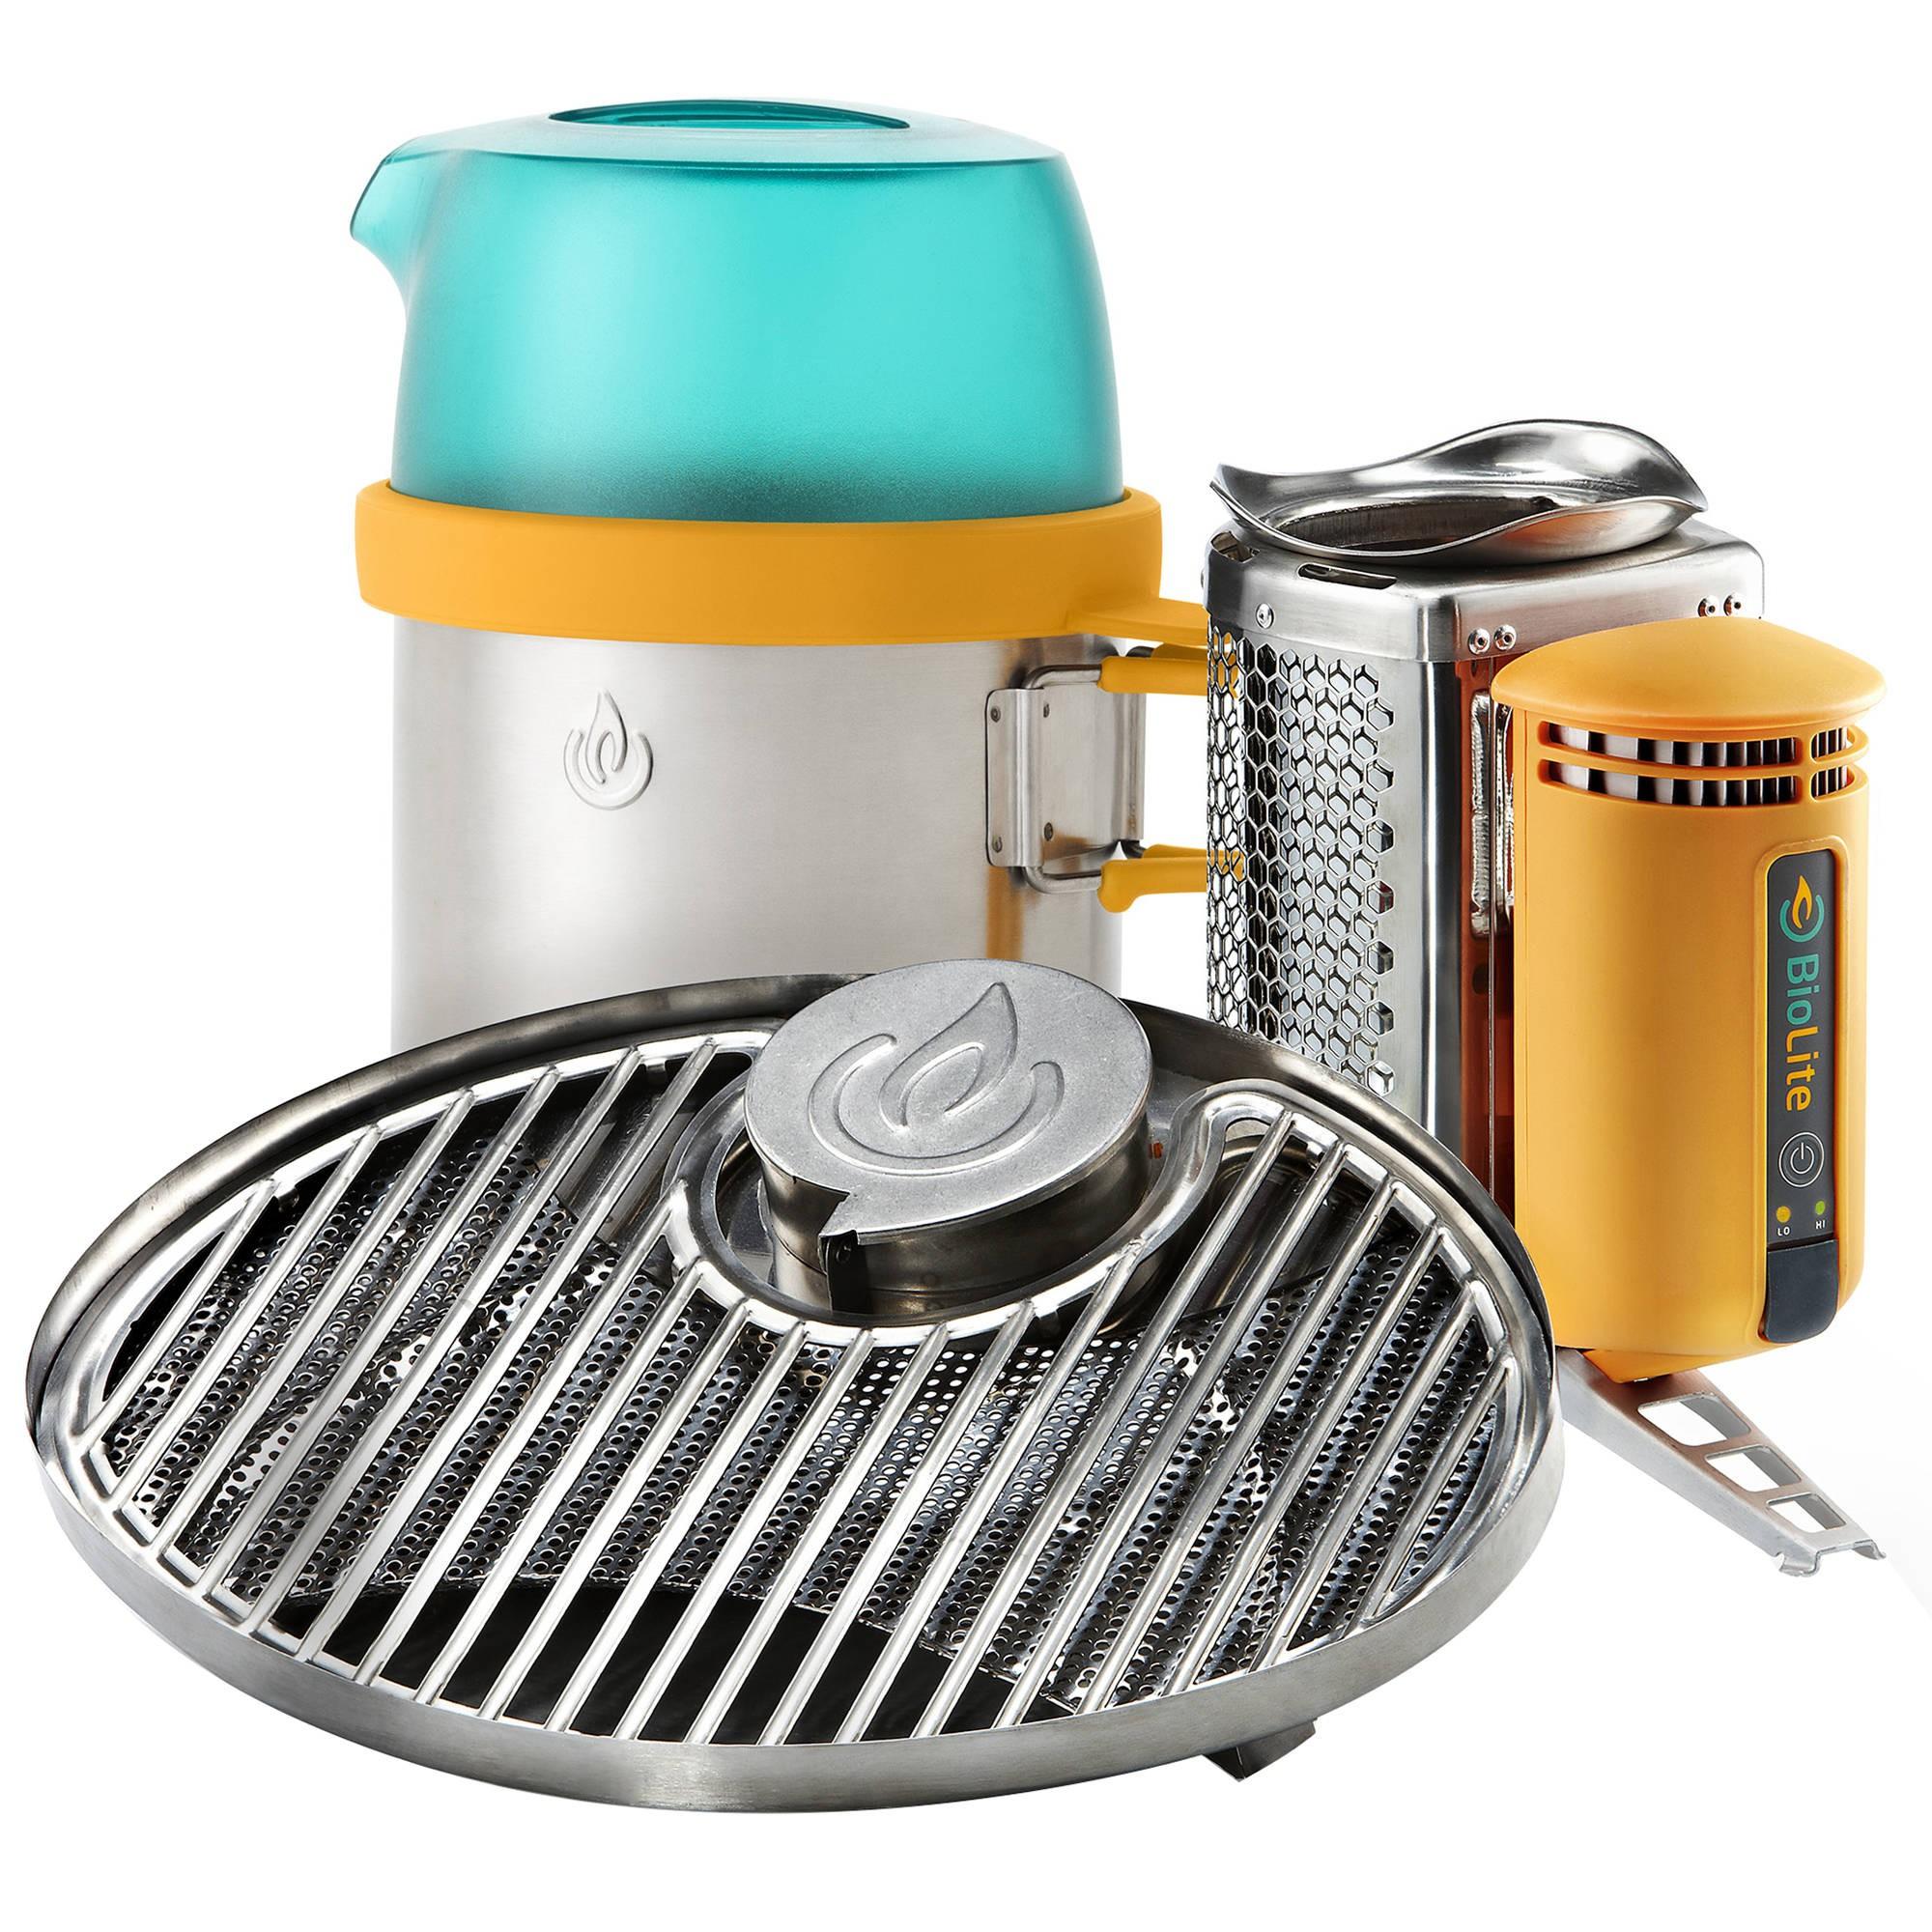 Pack Biolite CampStove + Grille Barbecue + KettlePot